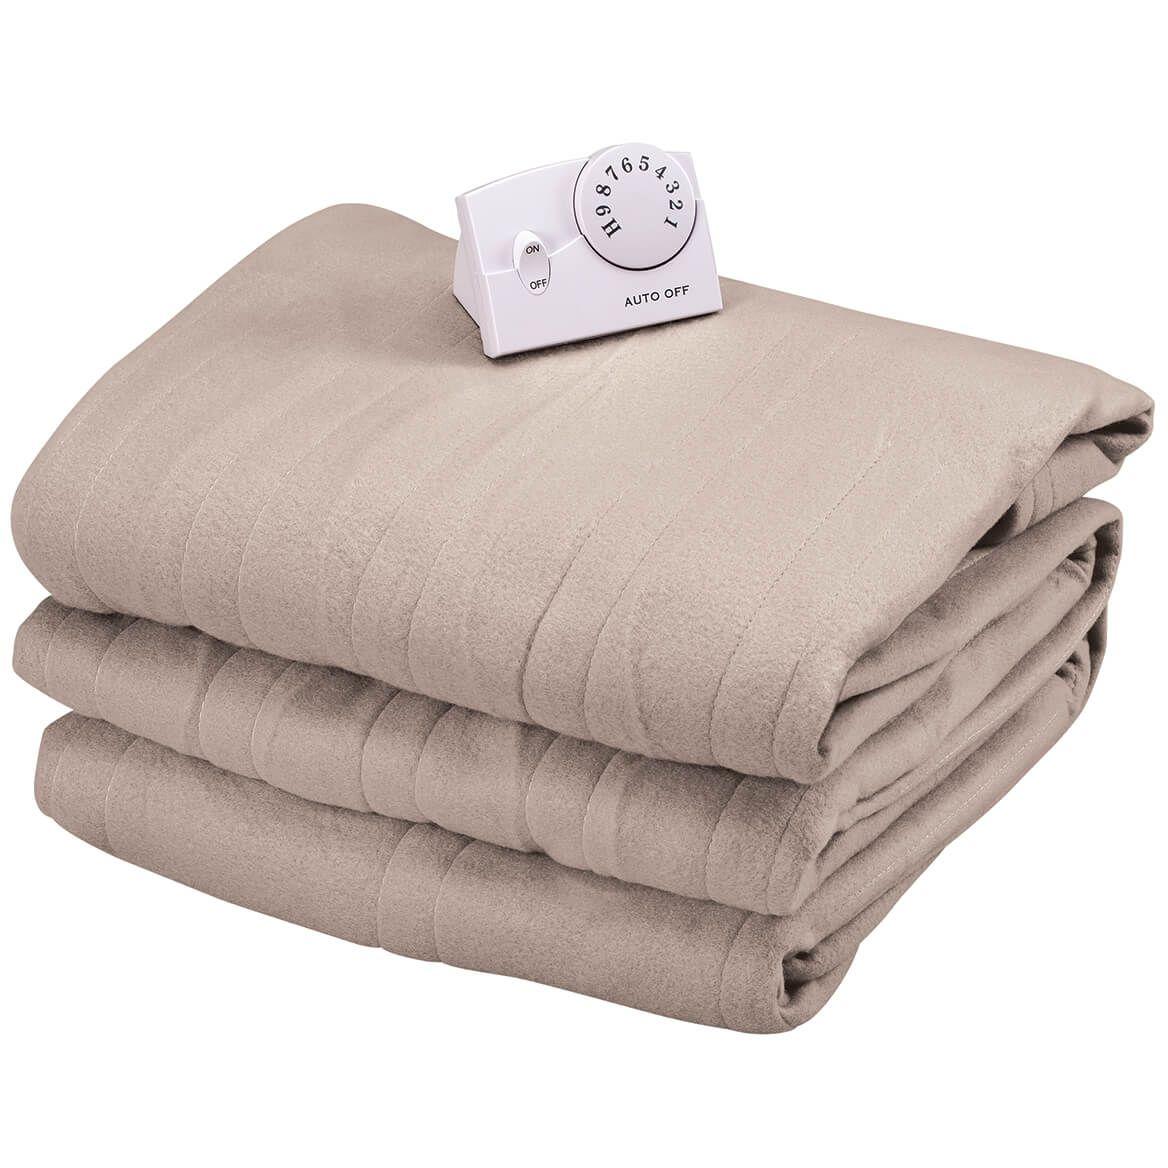 Automatic Heated Blanket by Biddeford-345117